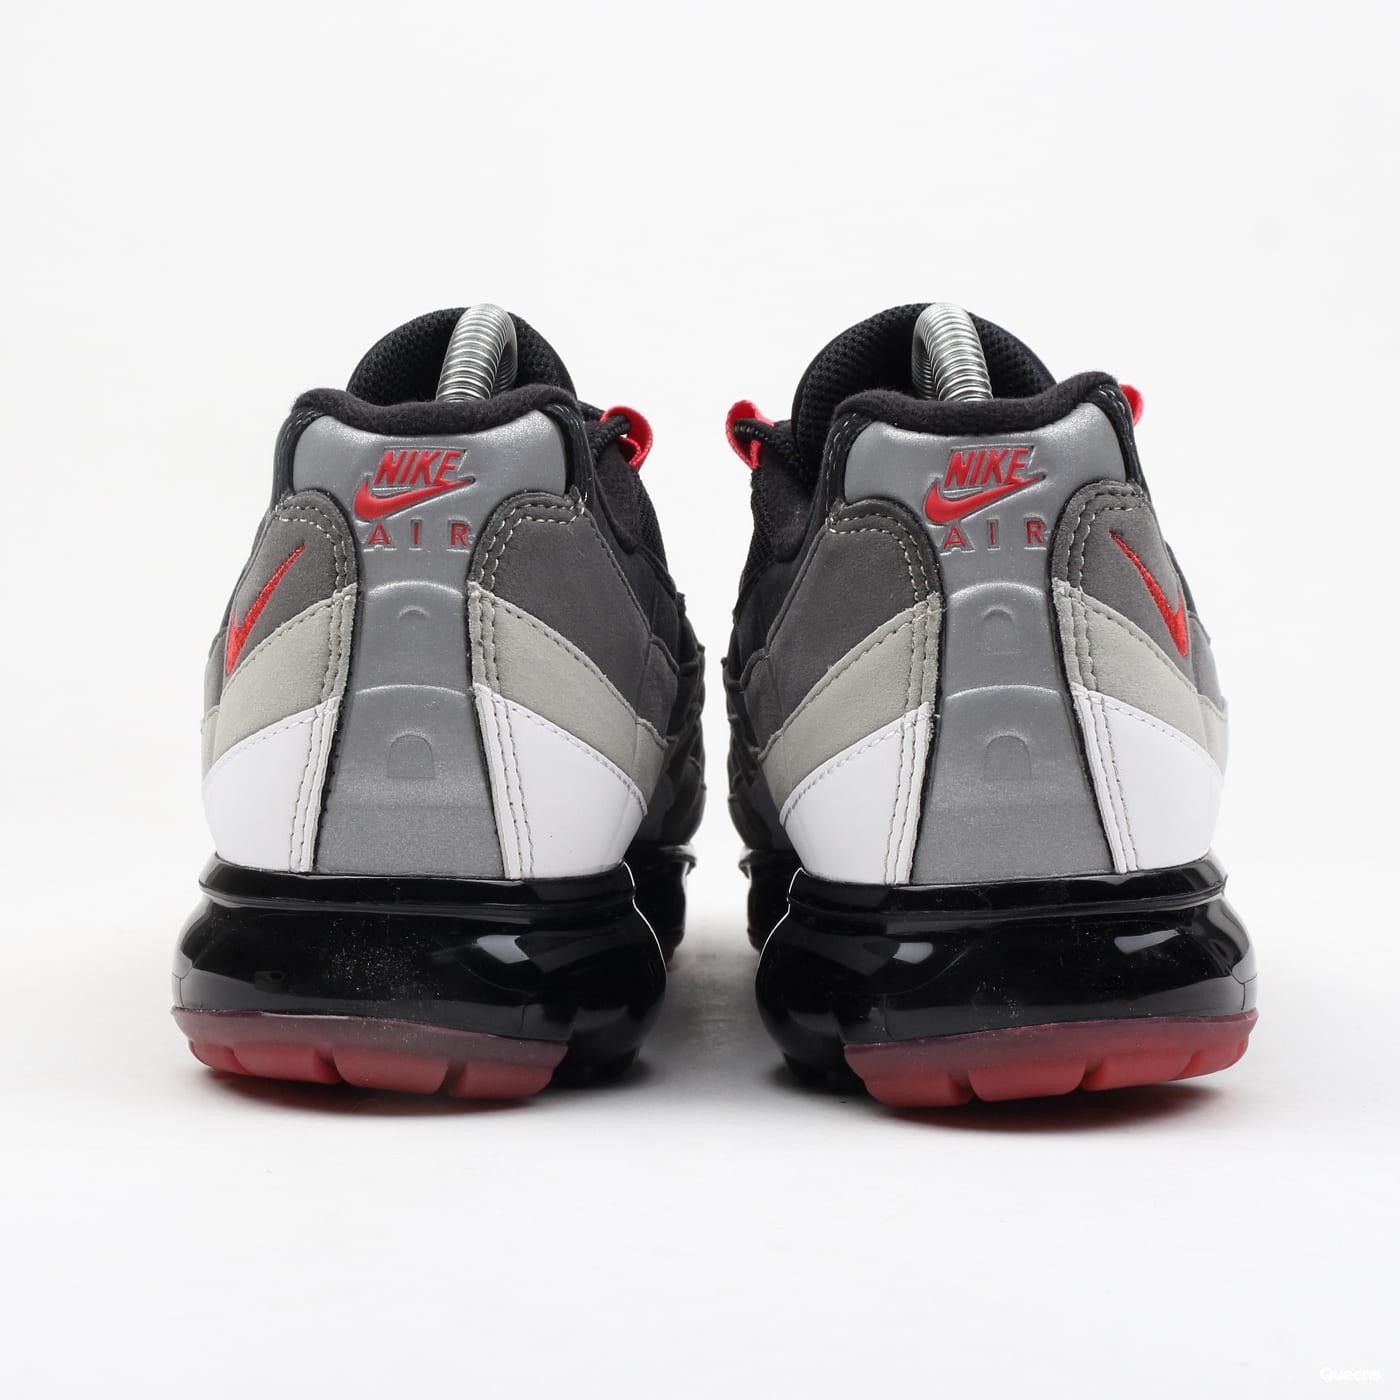 huge discount 970e4 13c8d Zoom in Zoom in Zoom in Zoom in Zoom in. Nike Air Vapormax  95 white   hot  red - dk pewter